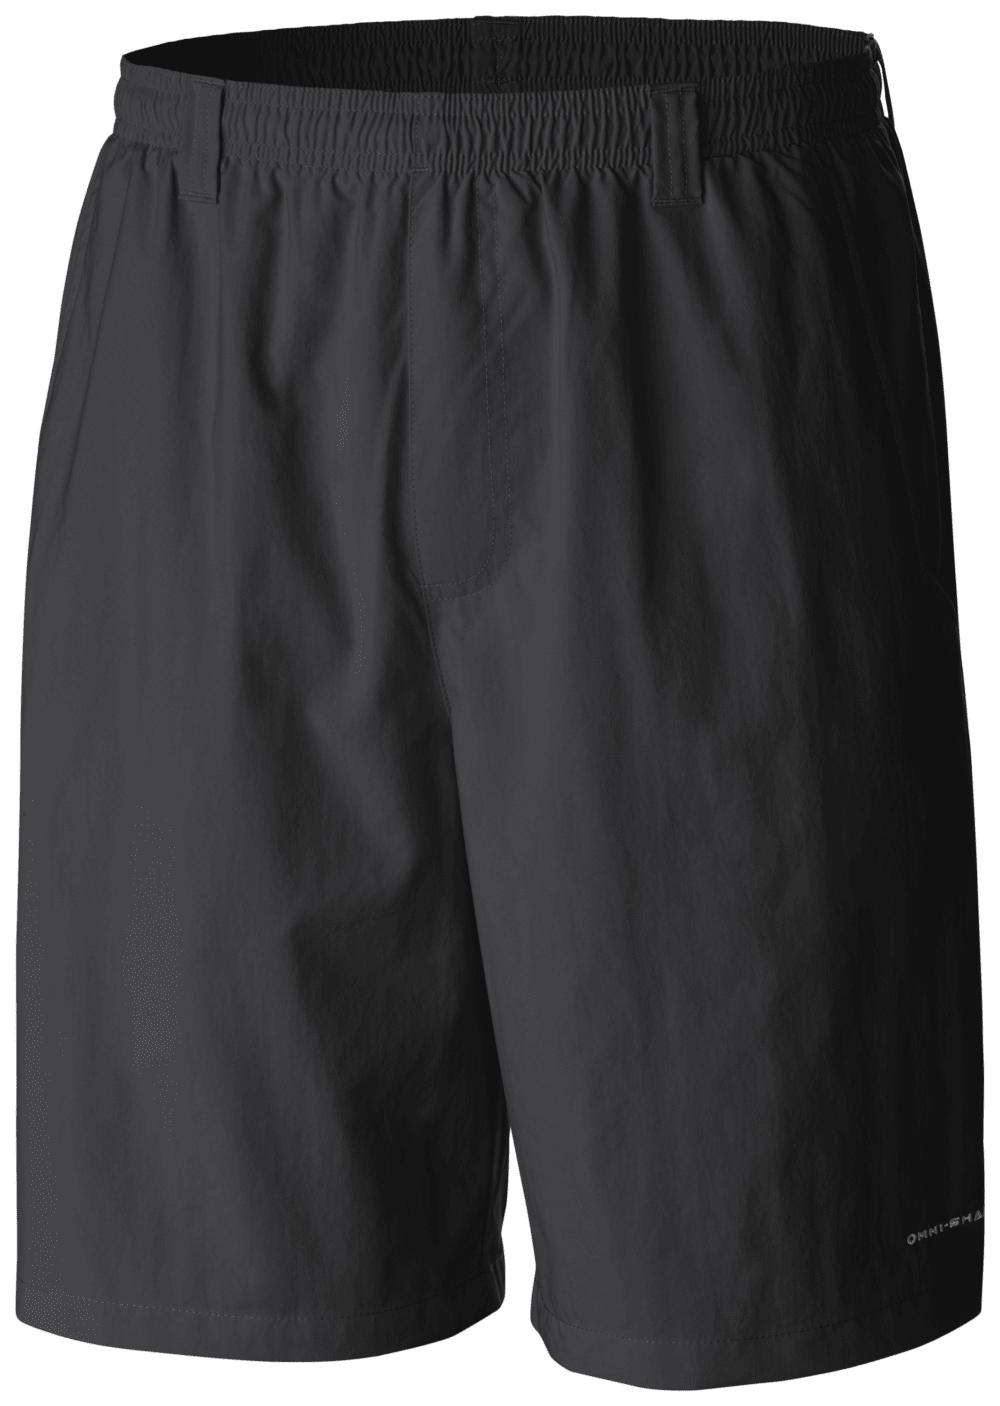 COLUMBIA Men's PFG Backcast III™ Water Shorts - BLACK-010